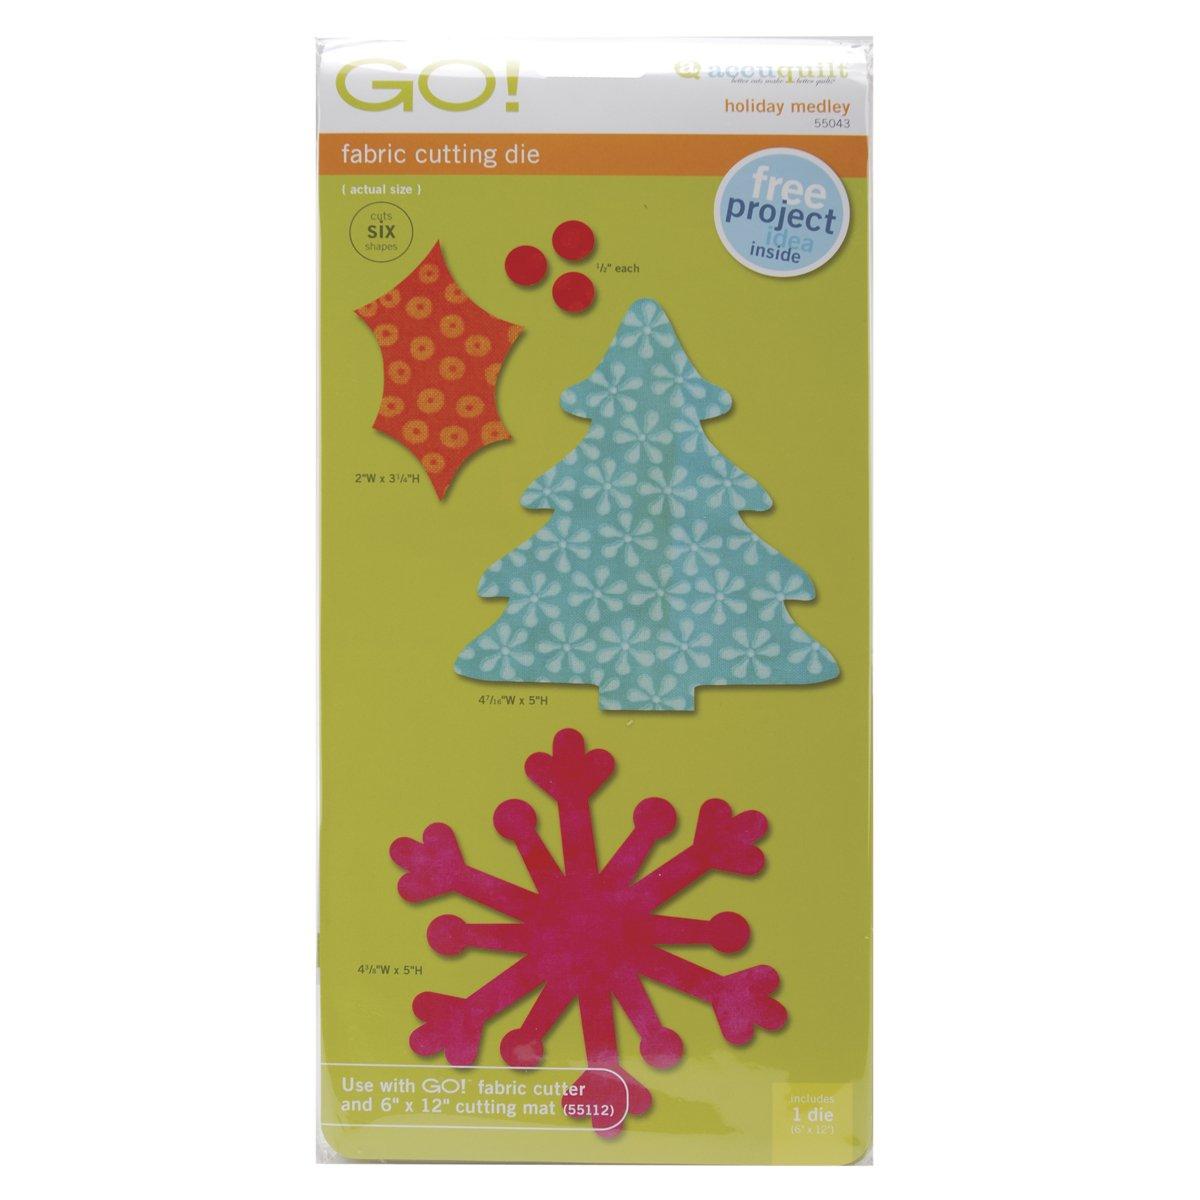 AccuQuilt 550-43 Go Fabric Cutting Dies, Holiday Medley